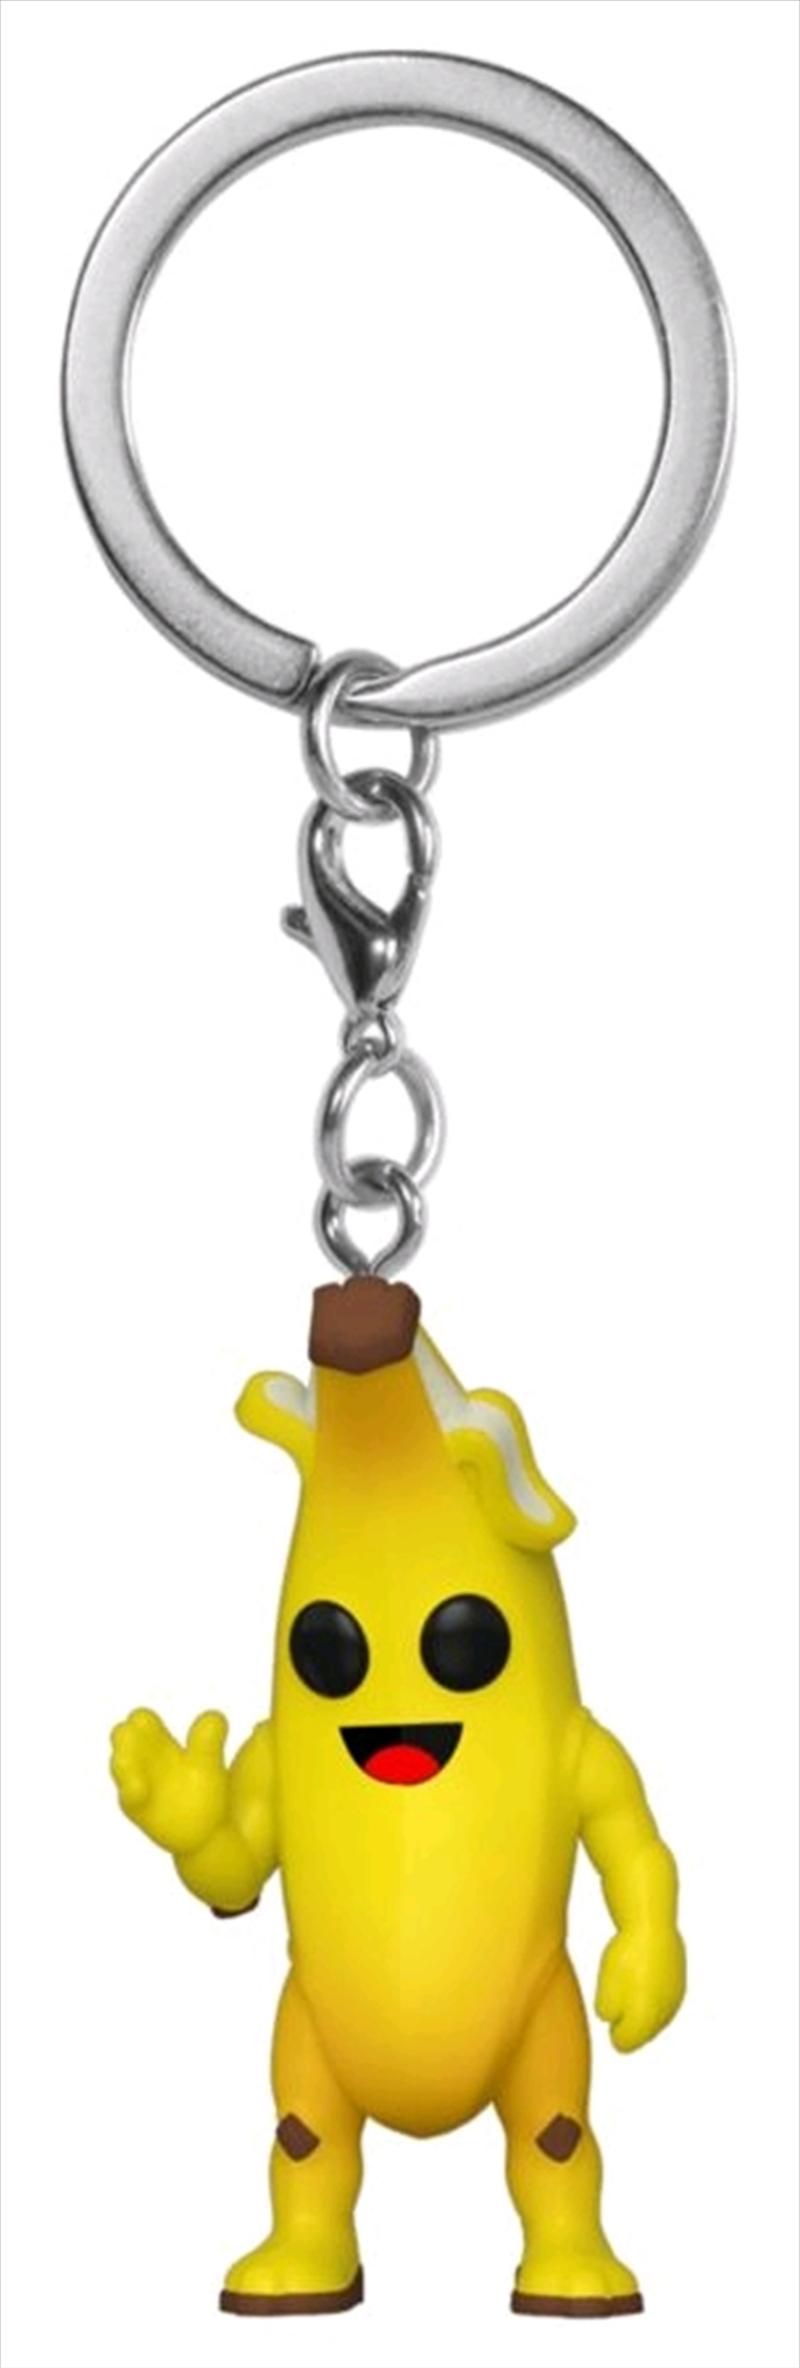 Fortnite - Peely Pocket Pop! Keychain | Pop Vinyl